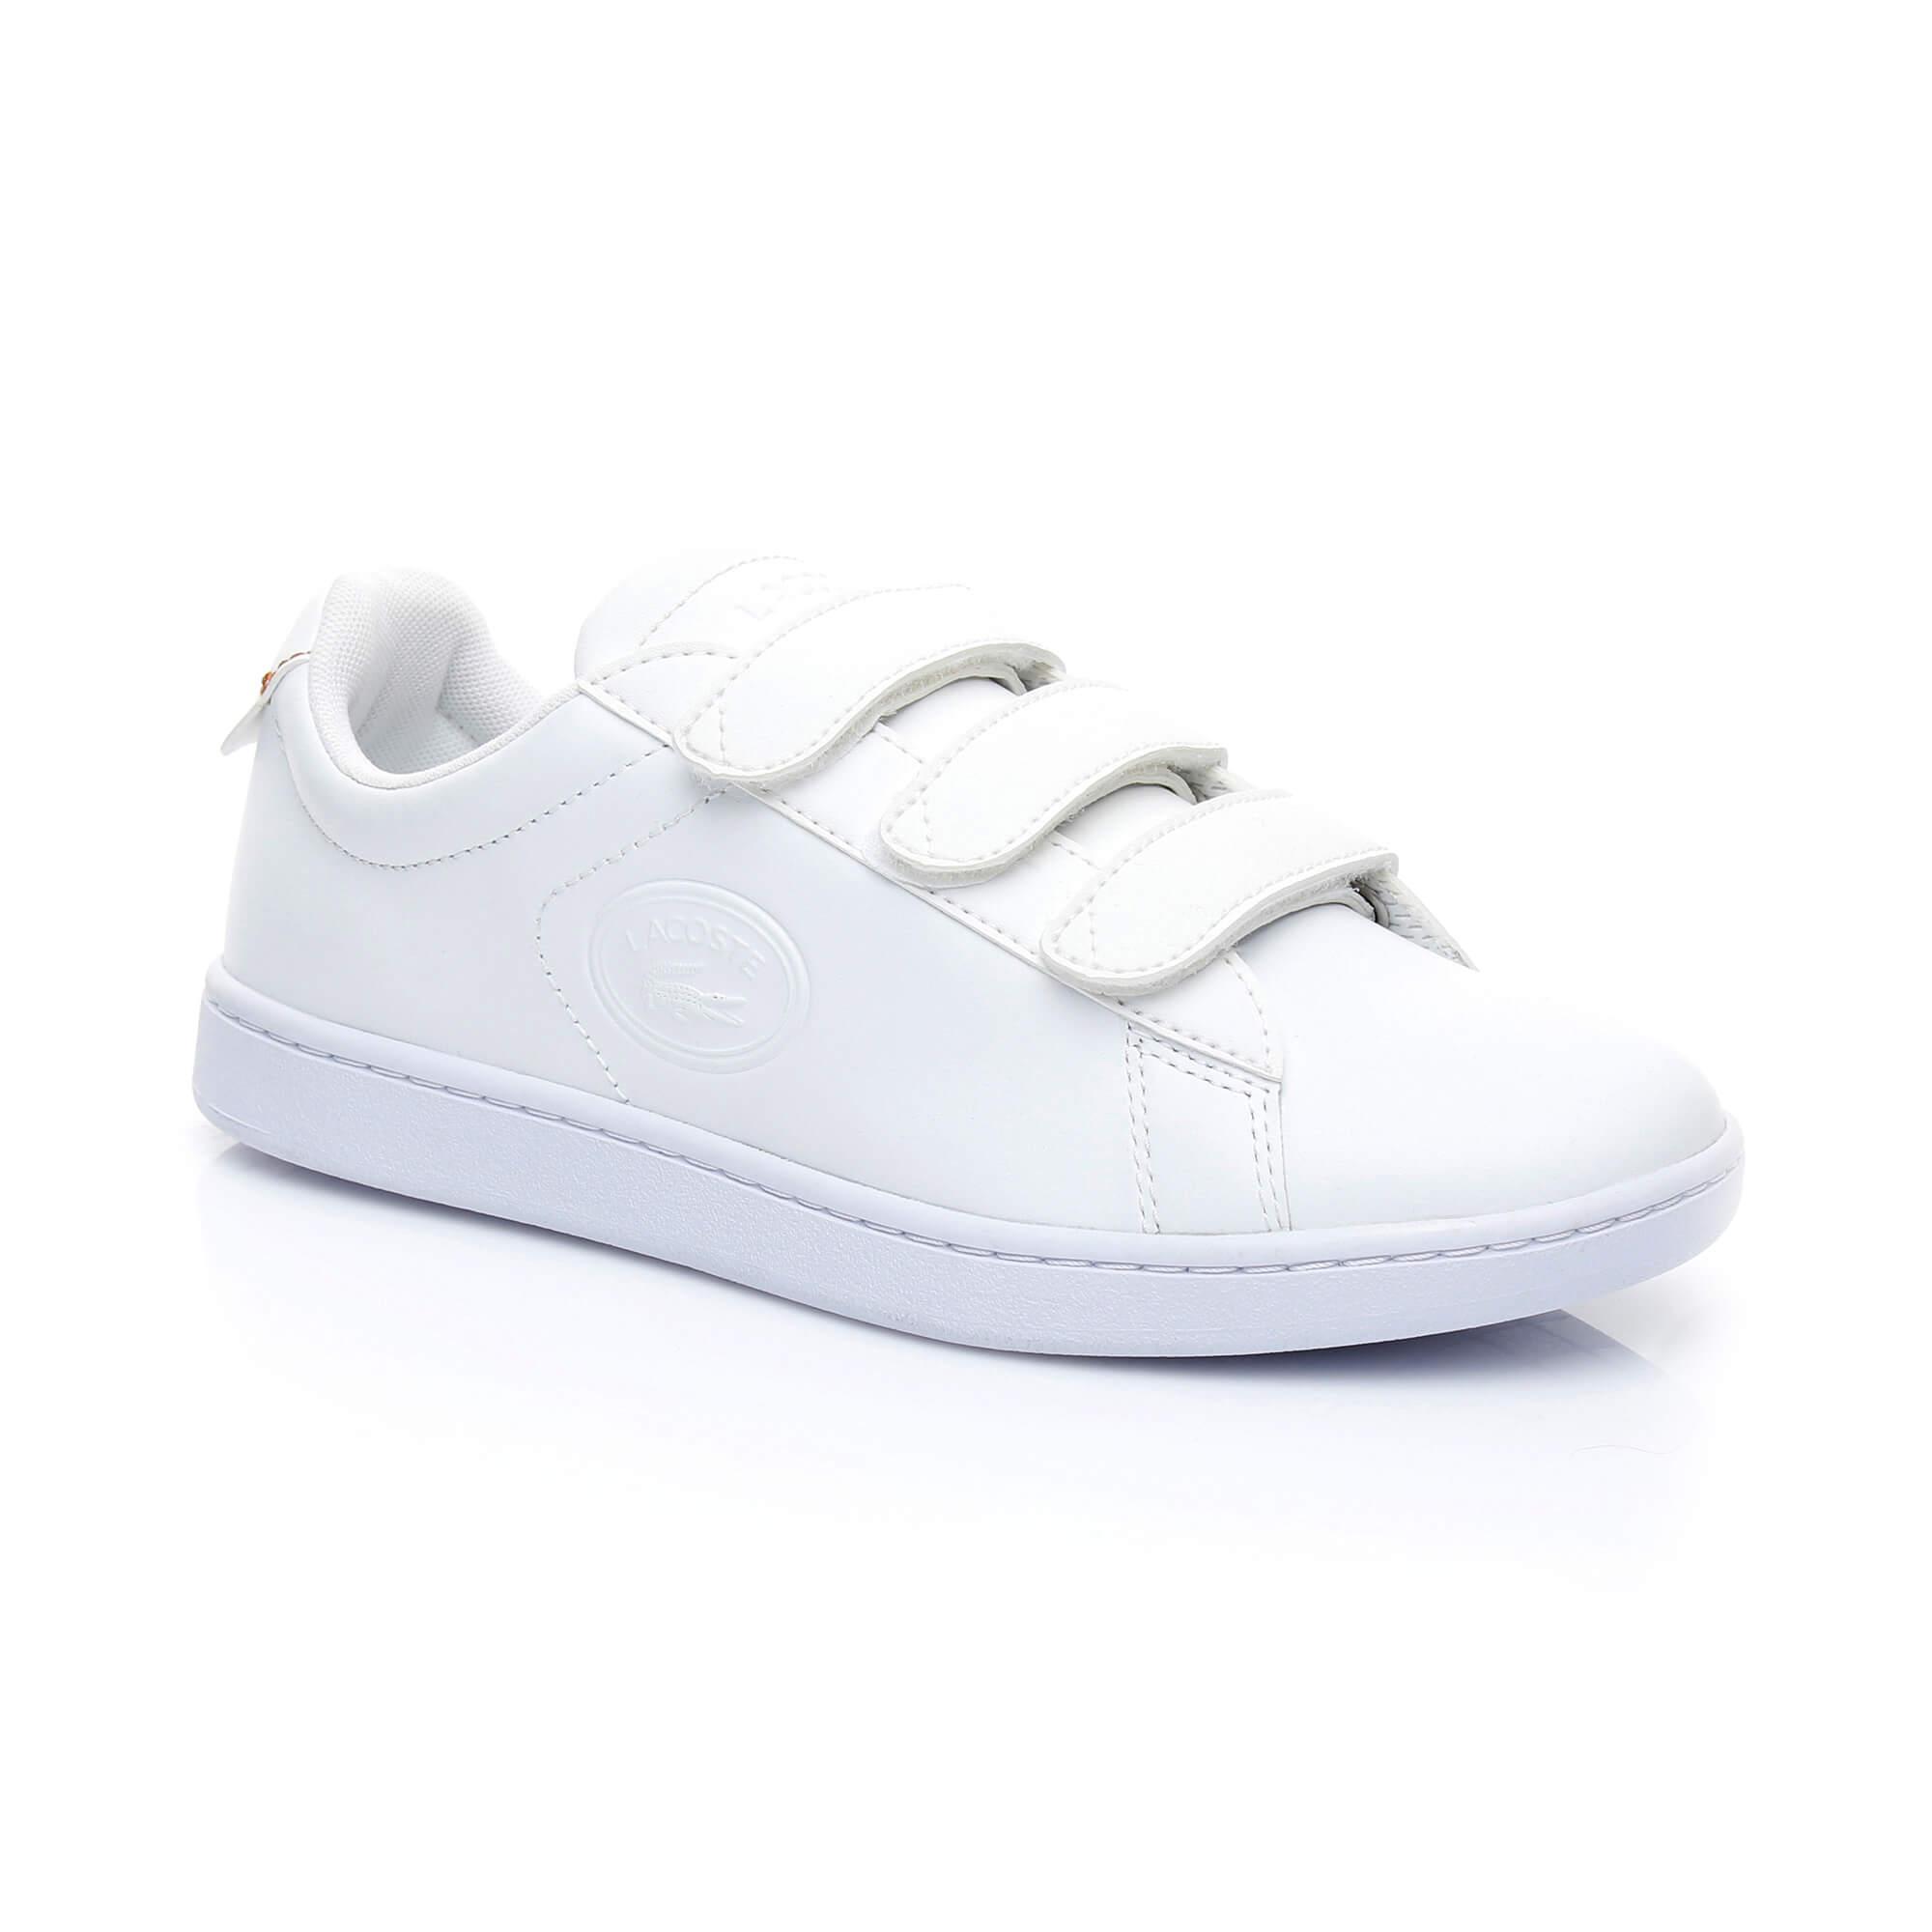 Lacoste Kadın Carnaby Evo Strap 3181 Beyaz Sneaker